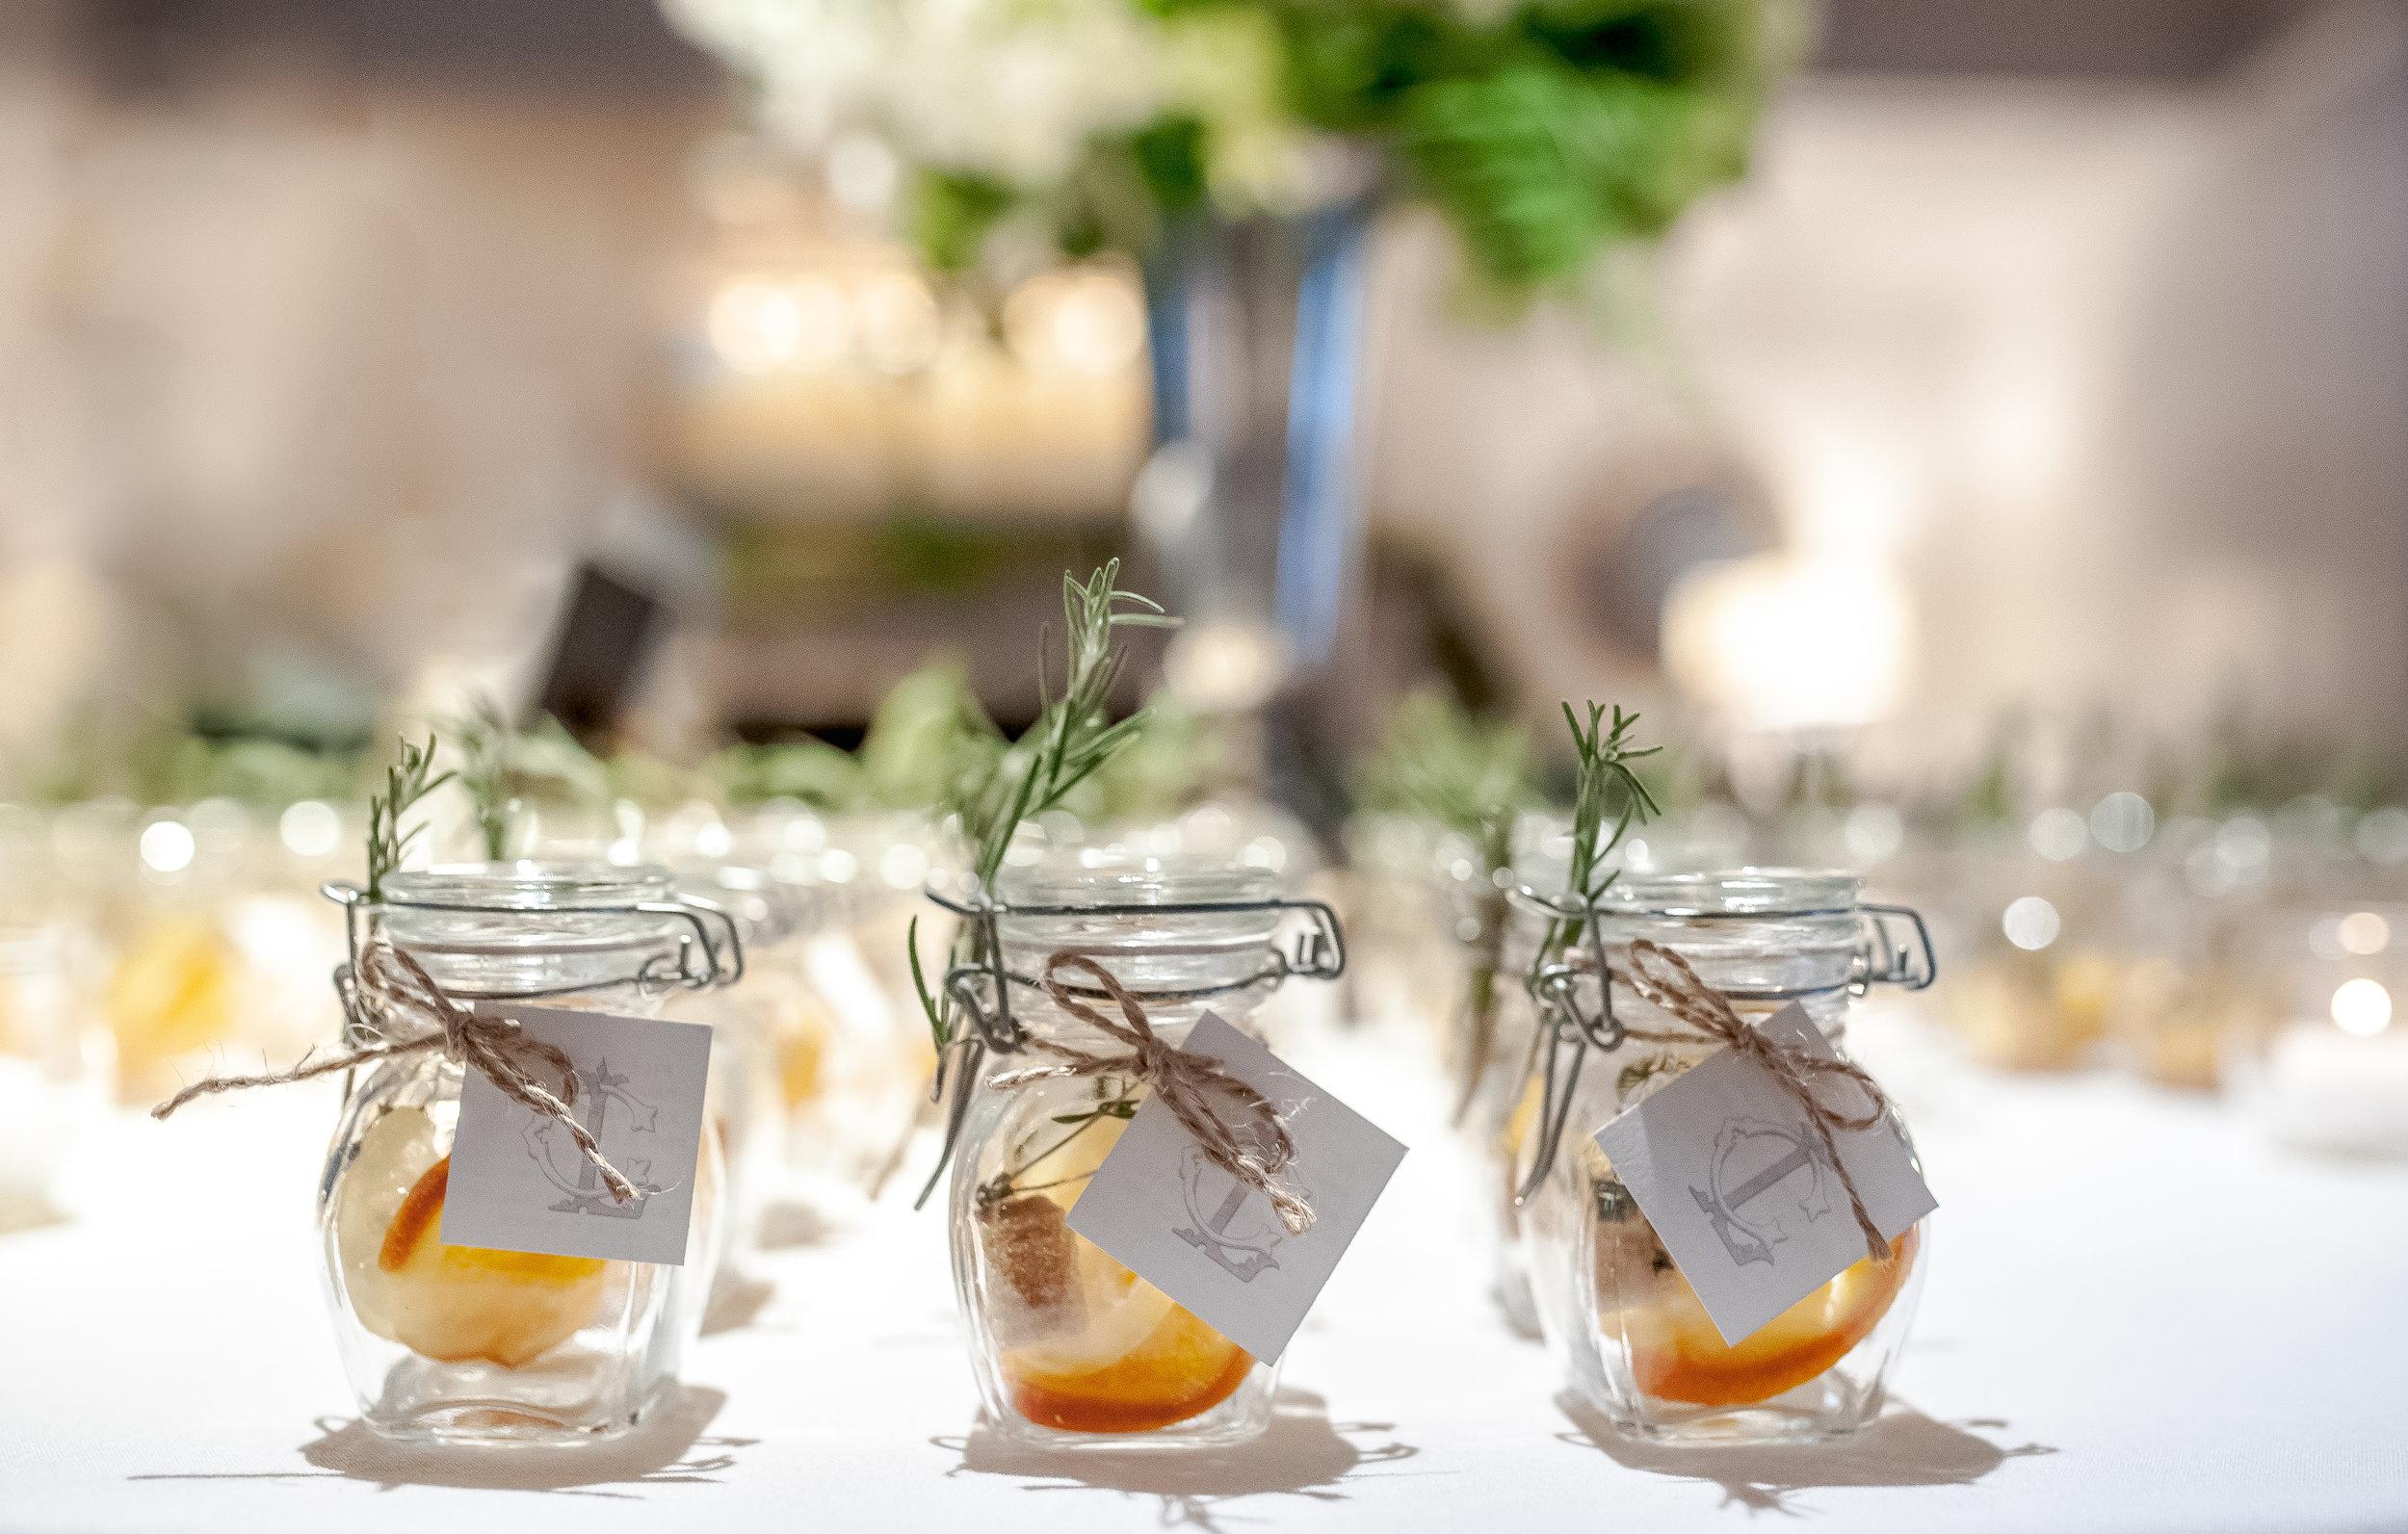 Jeremie_Barlow_Photography_Steffen_Sudyam_wedding_2018-848.jpg